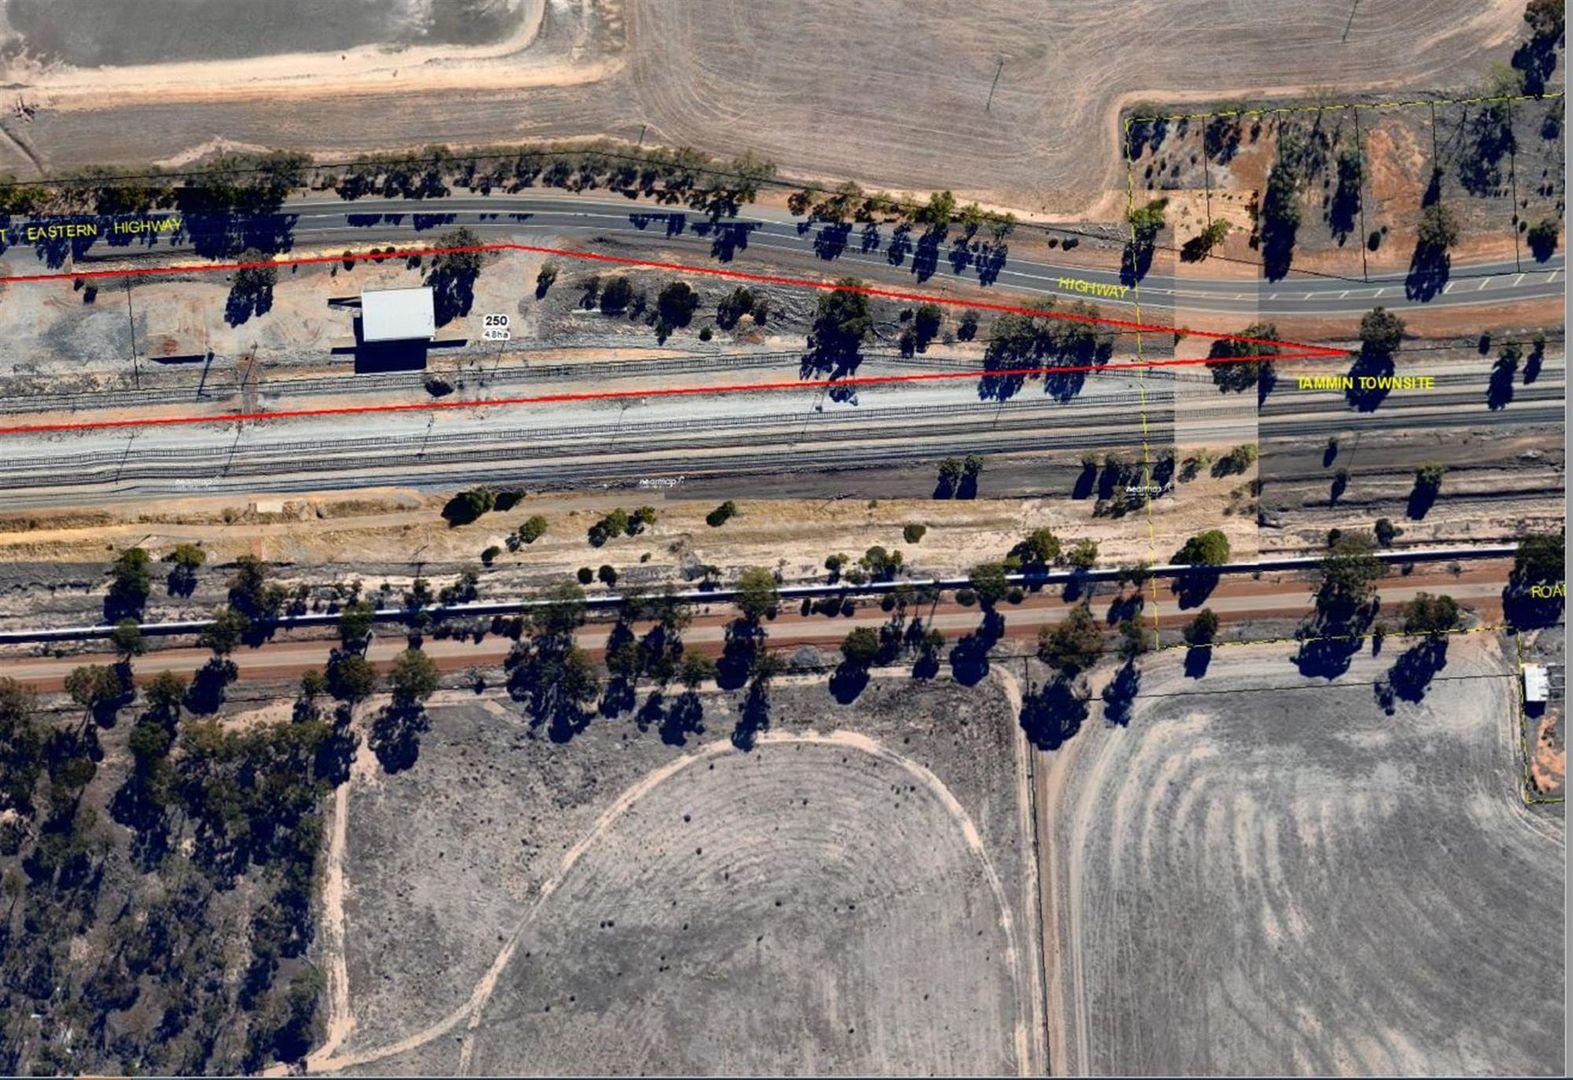 Lot  251 Great Eastern Highway, Tammin WA 6409, Image 0